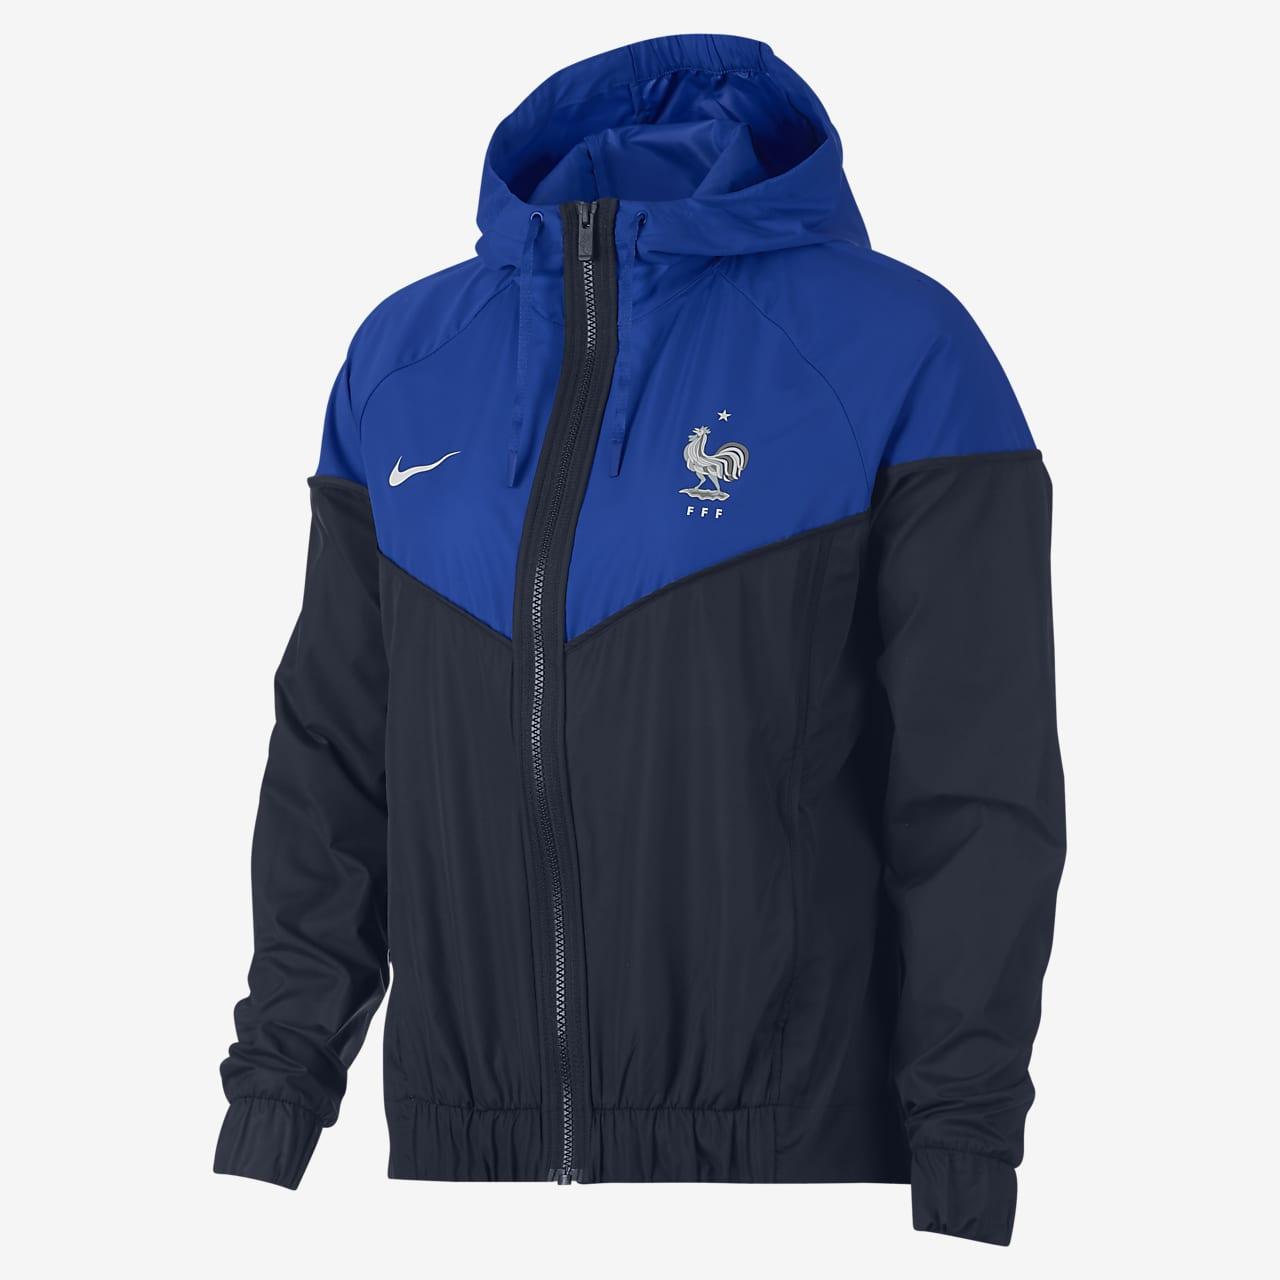 FFF Authentic Windrunner jakke til dame